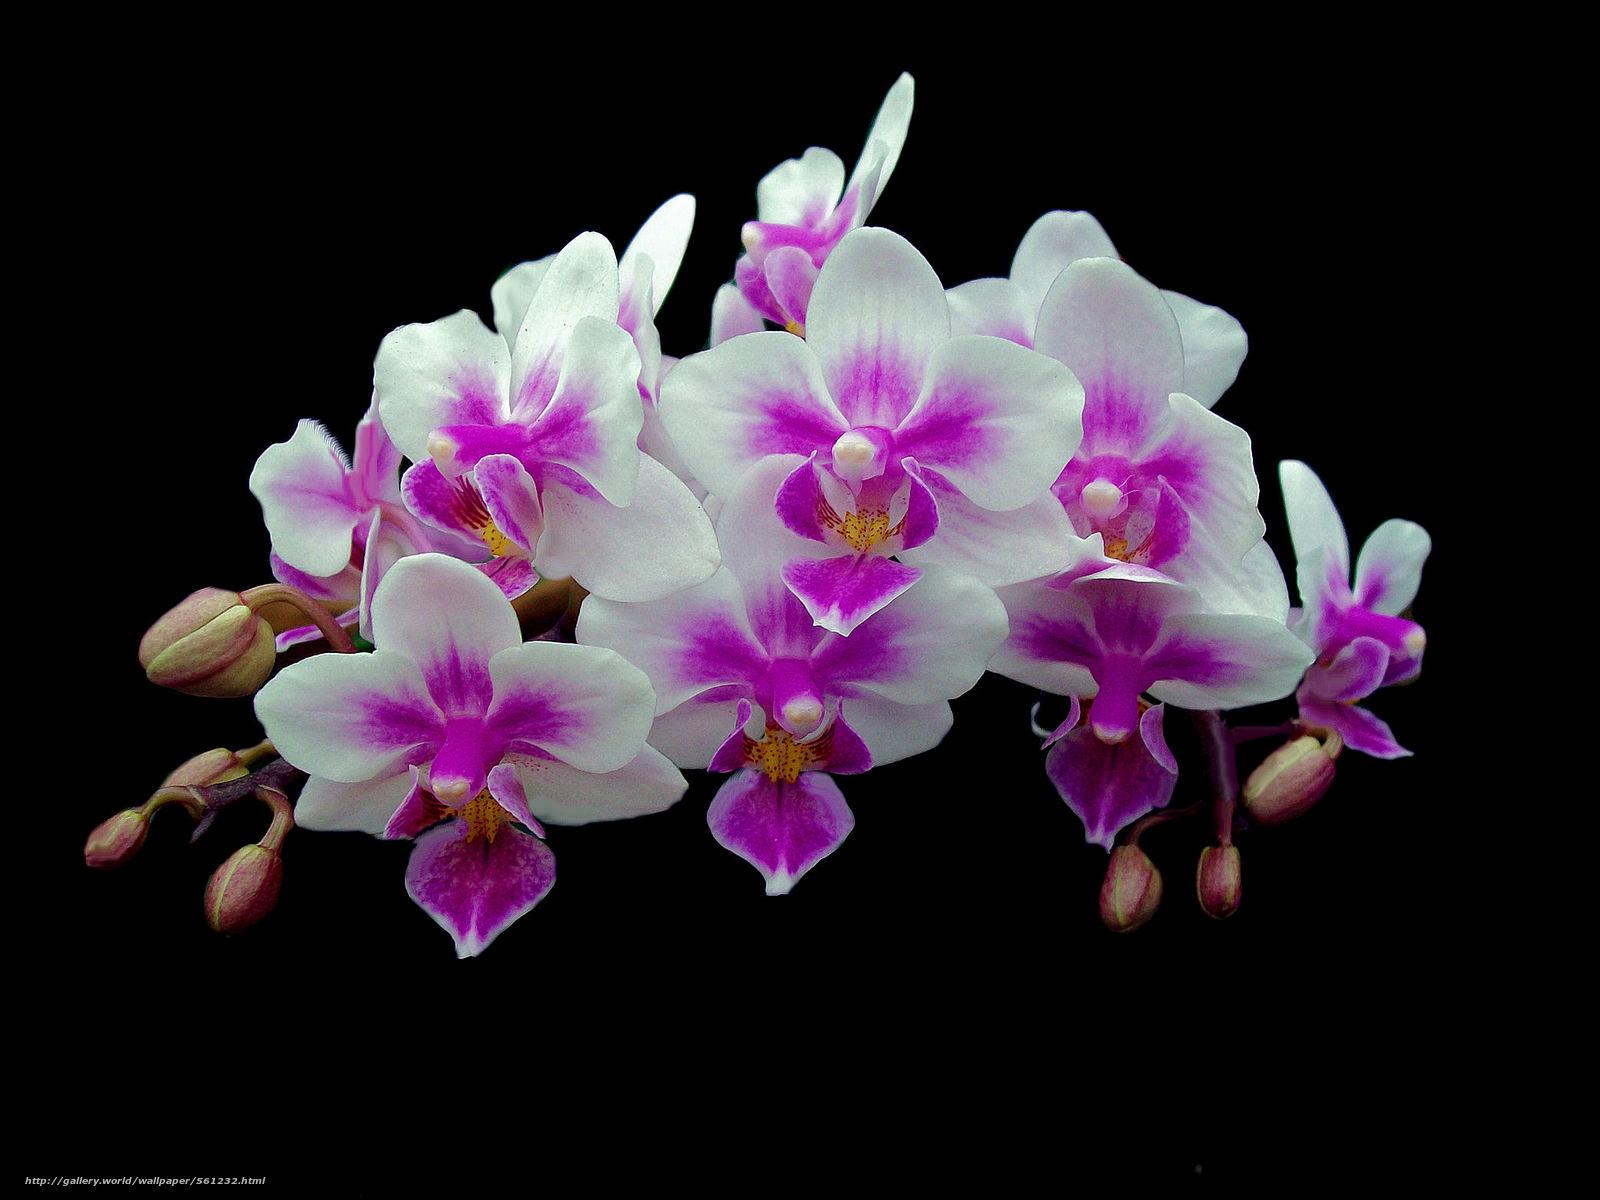 Tlcharger Fond D Ecran Orchidee Fleur Flore Fonds D Ecran